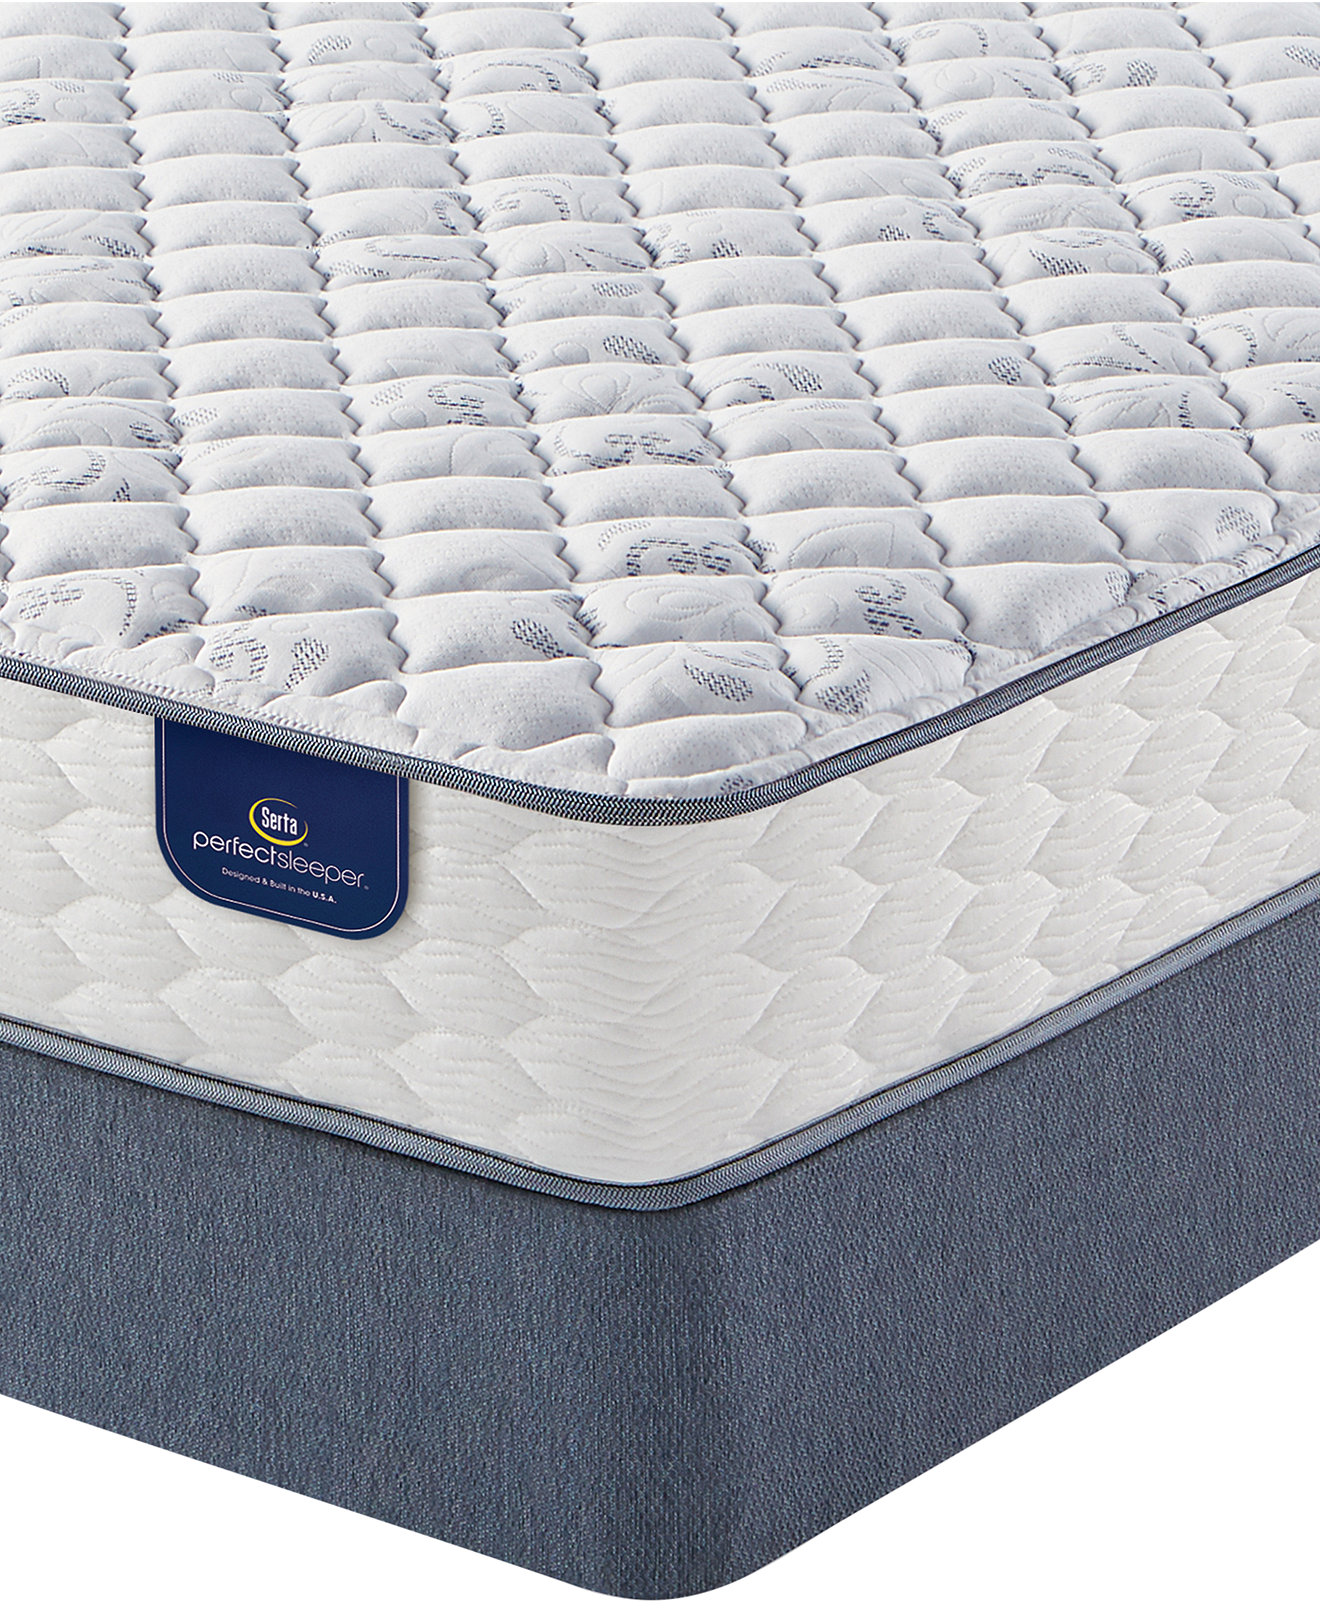 "Serta Perfect Sleeper® Elegant Haven 10.5"" Cushion Firm Mattress Collection"